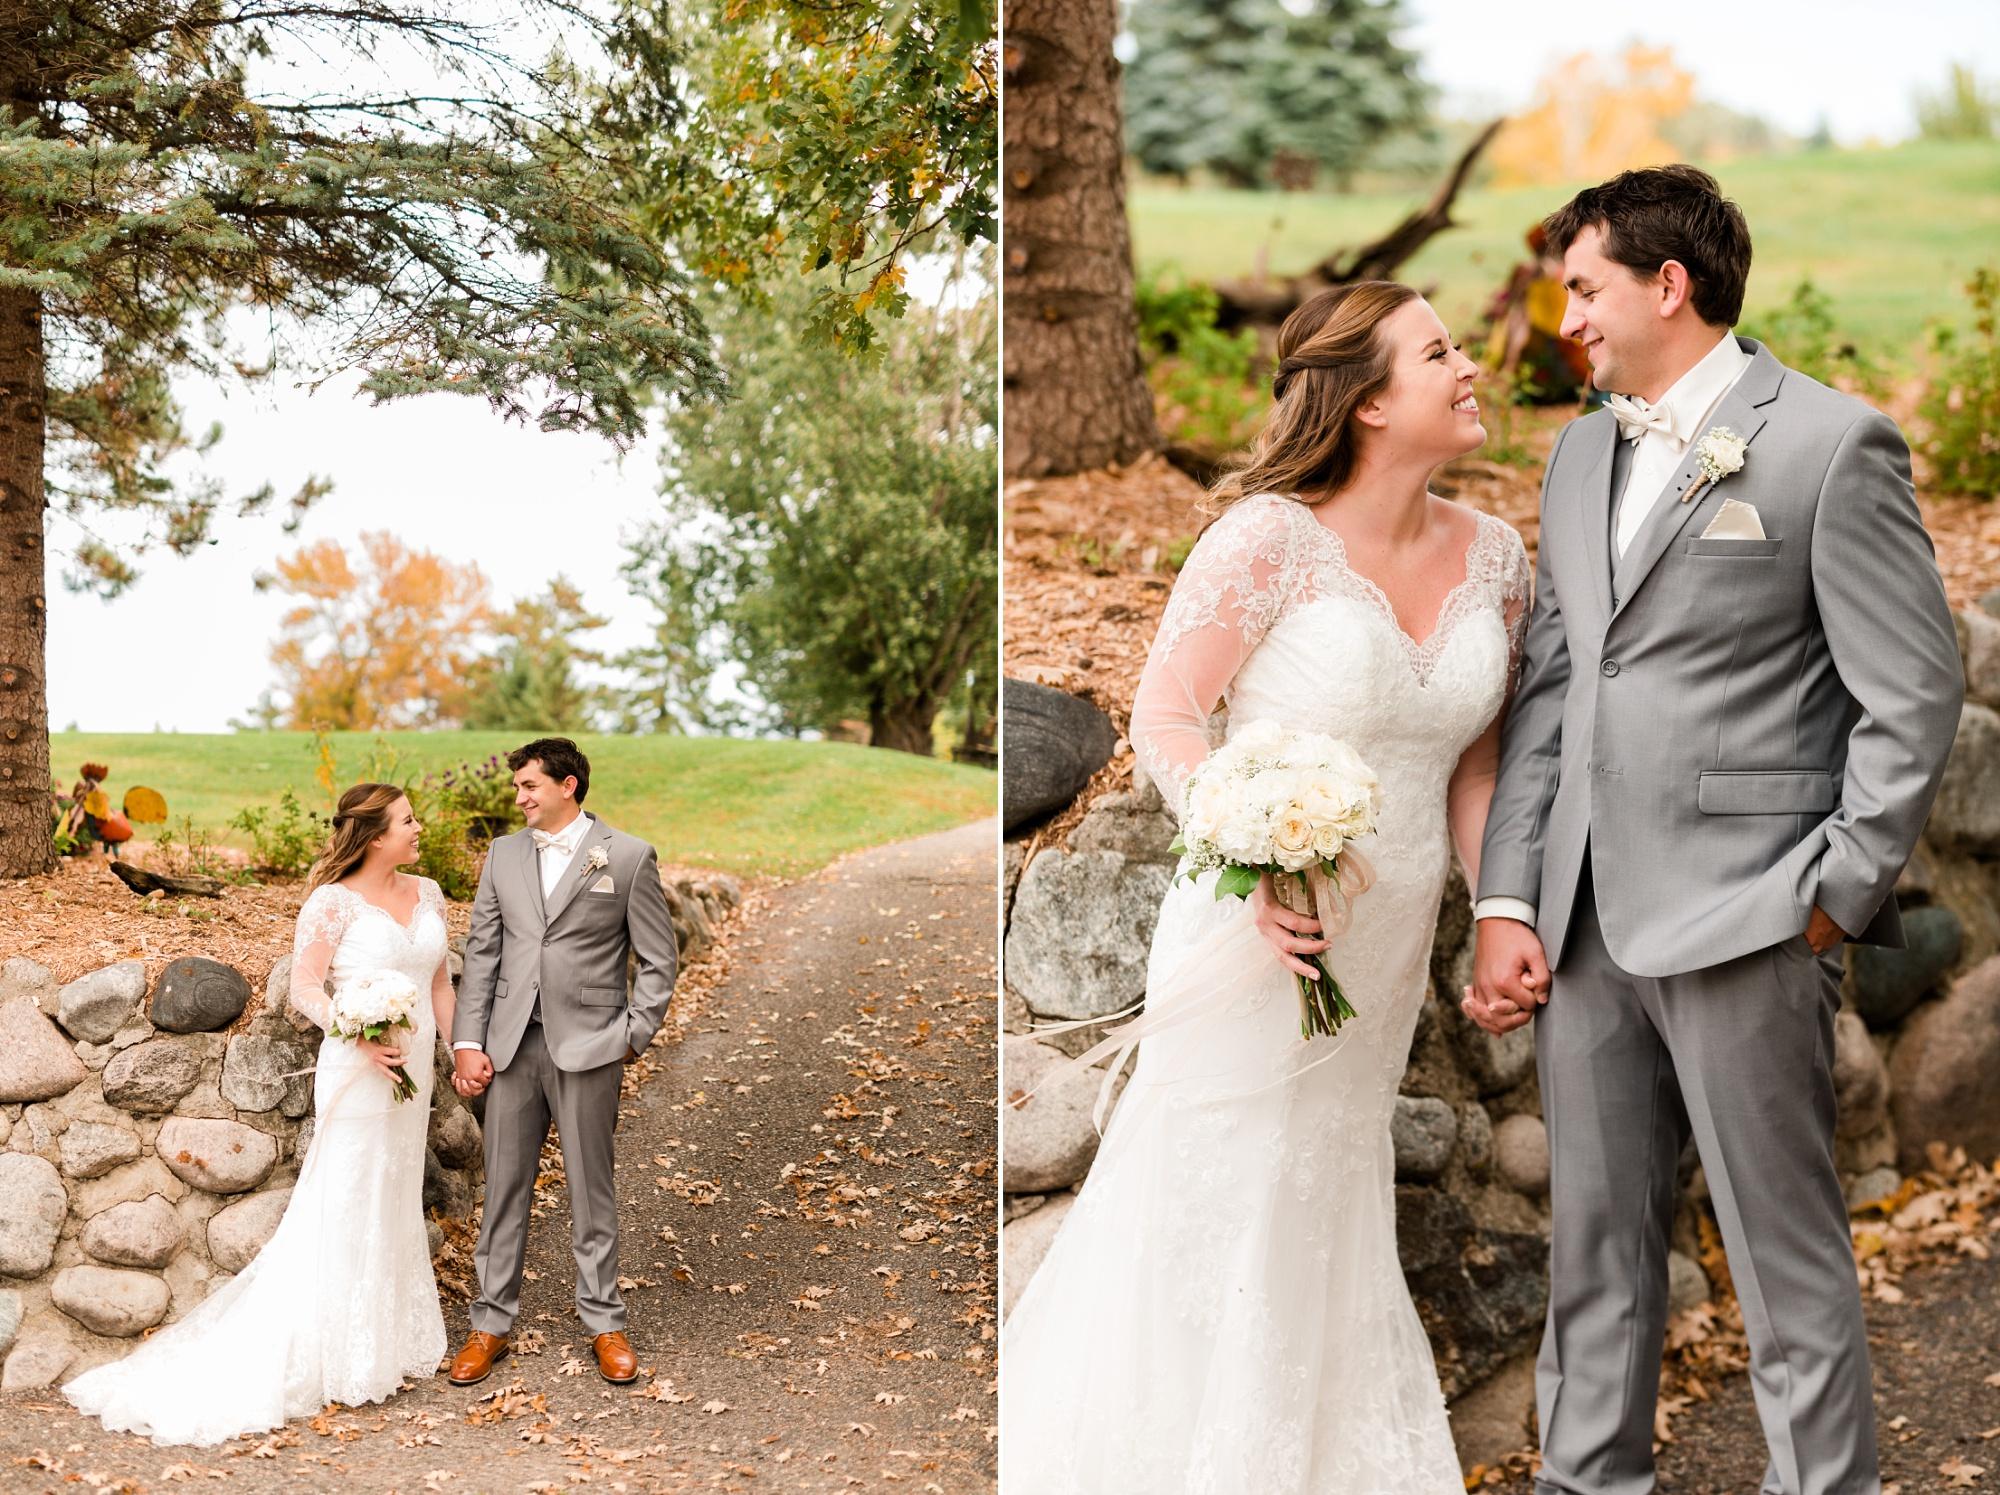 AmberLangerudPhotography_Fair Hills Resort Lakeside Wedding in Minnesota_3428.jpg